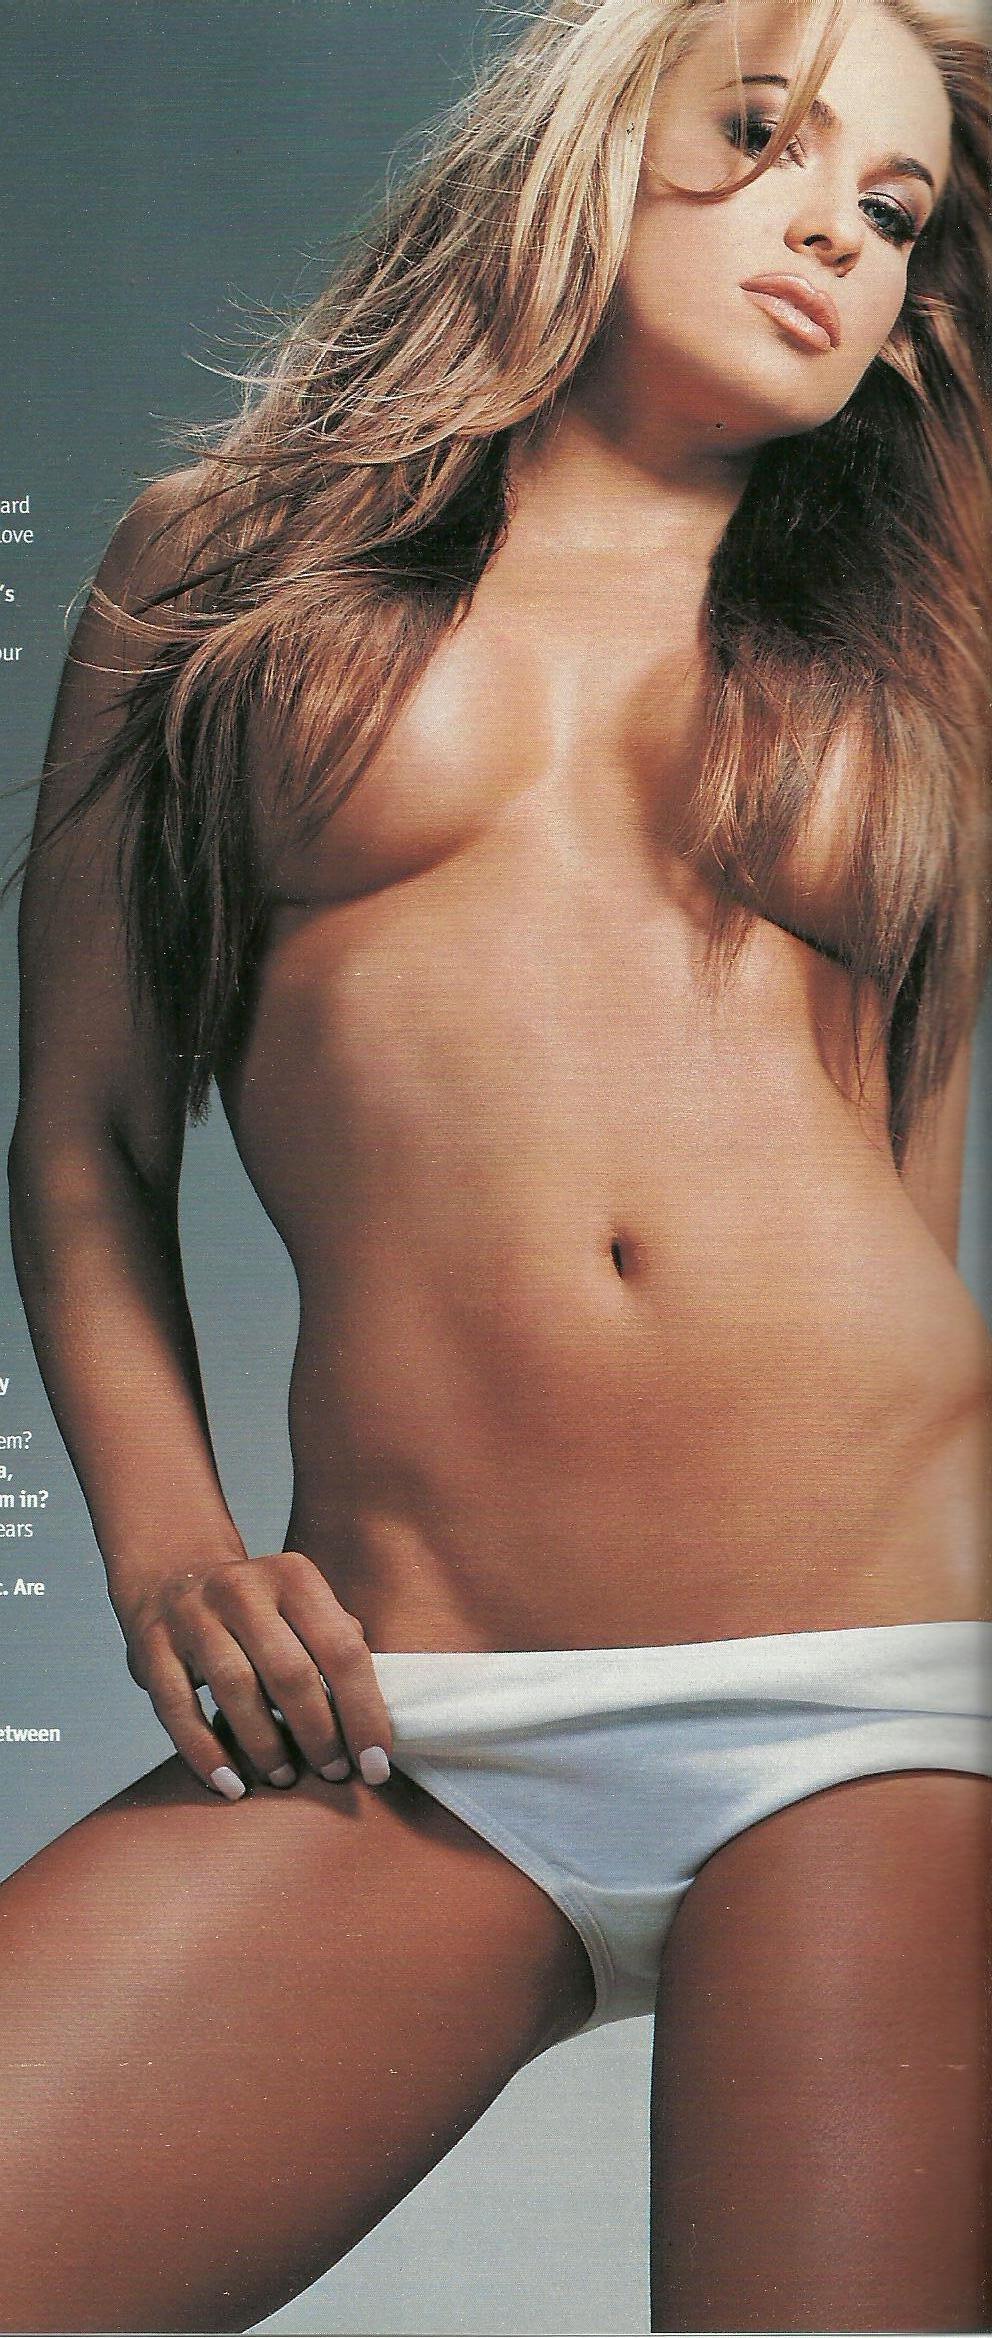 Cherie Roberts,Victoria Cartagena Porn clip Mabel Trunnelle,Tabrett Bethell